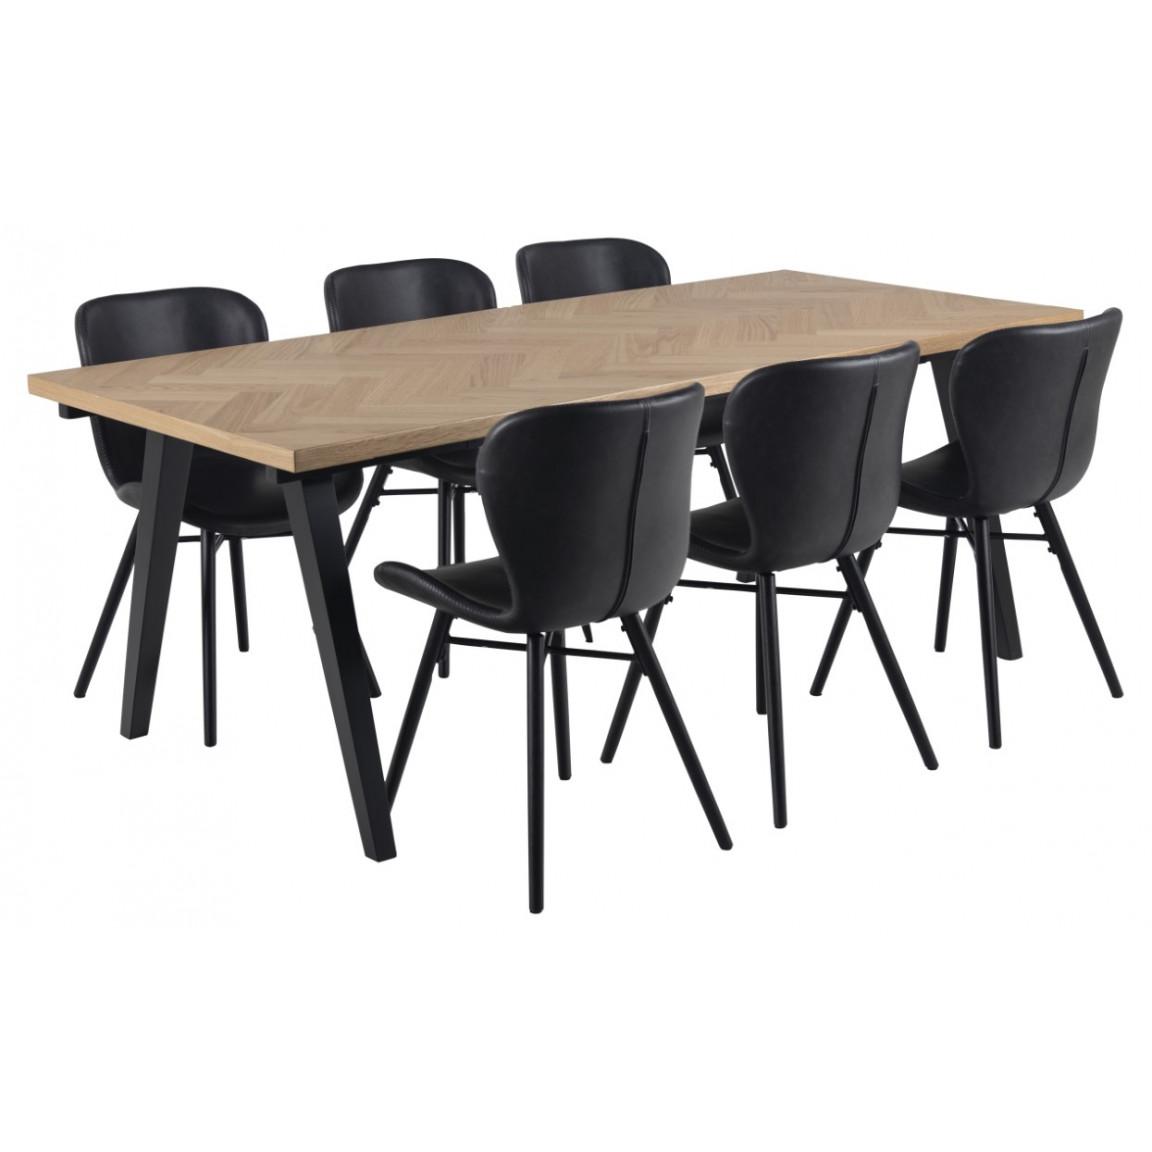 Set of 2 Chairs Matilda-A1   Black